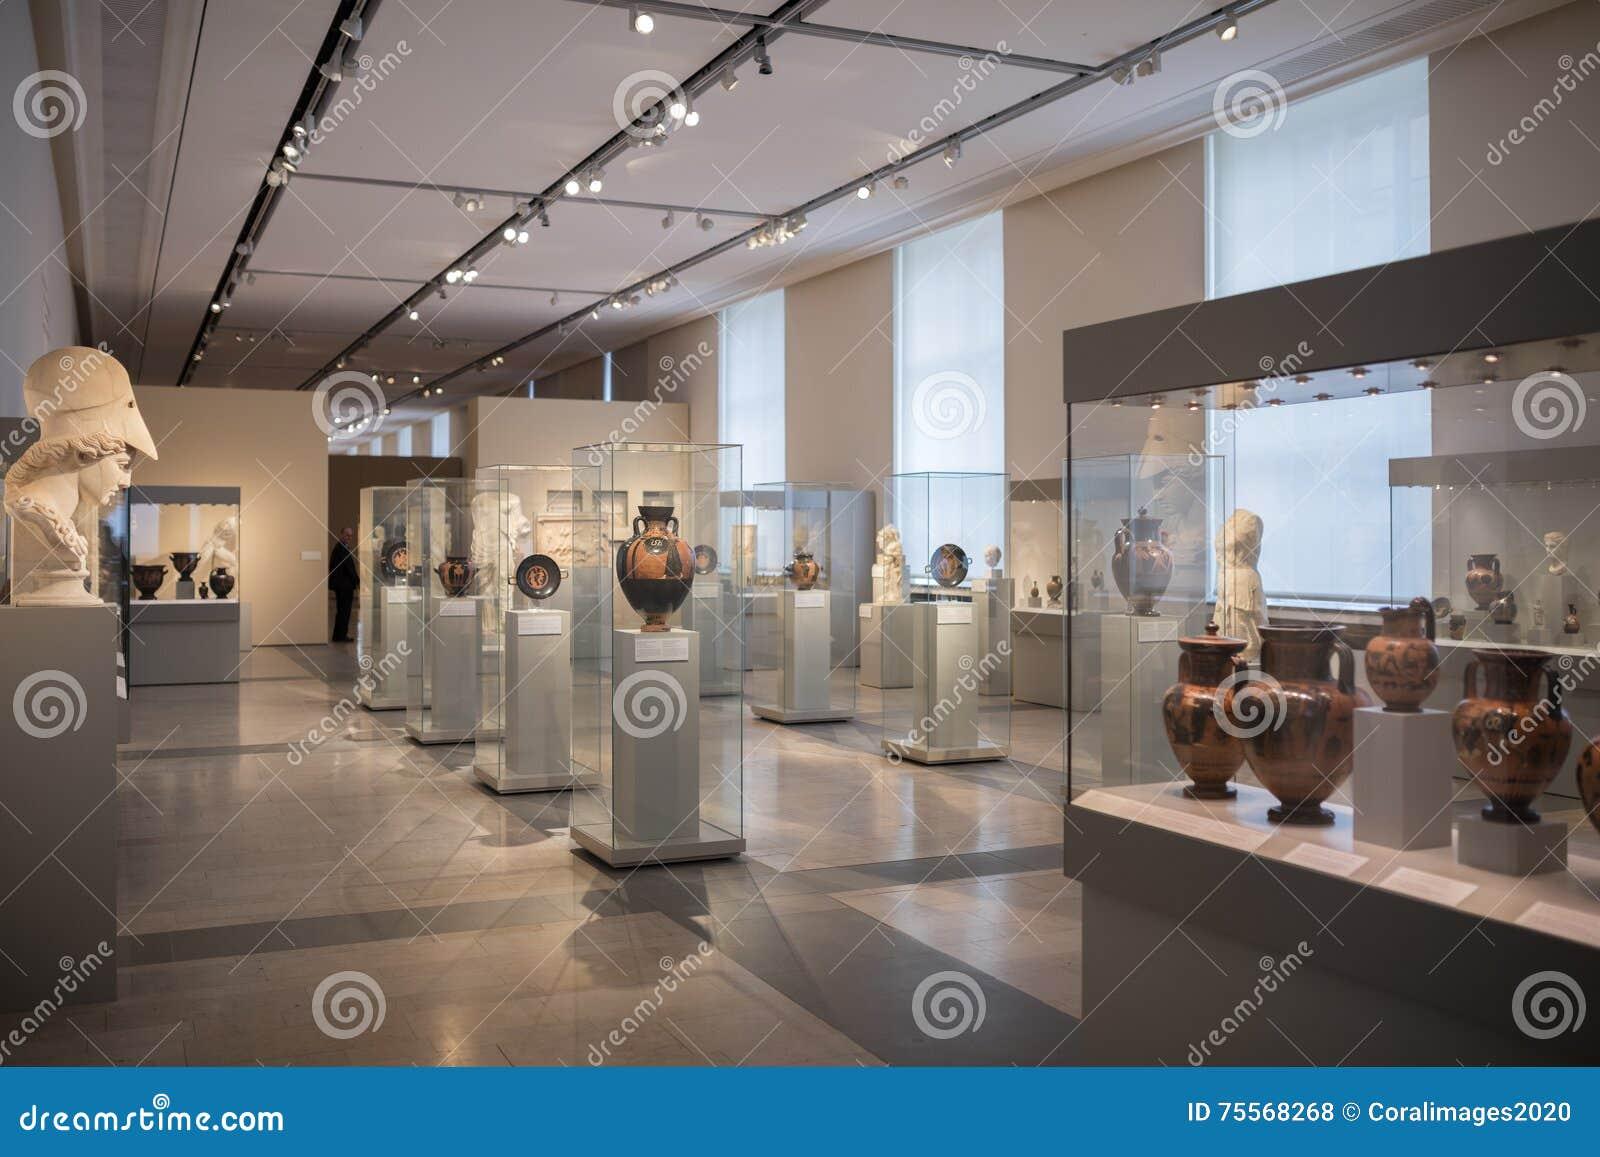 Interior Of Altes Museum Berlin Editorial Stock Photo - Image of ...